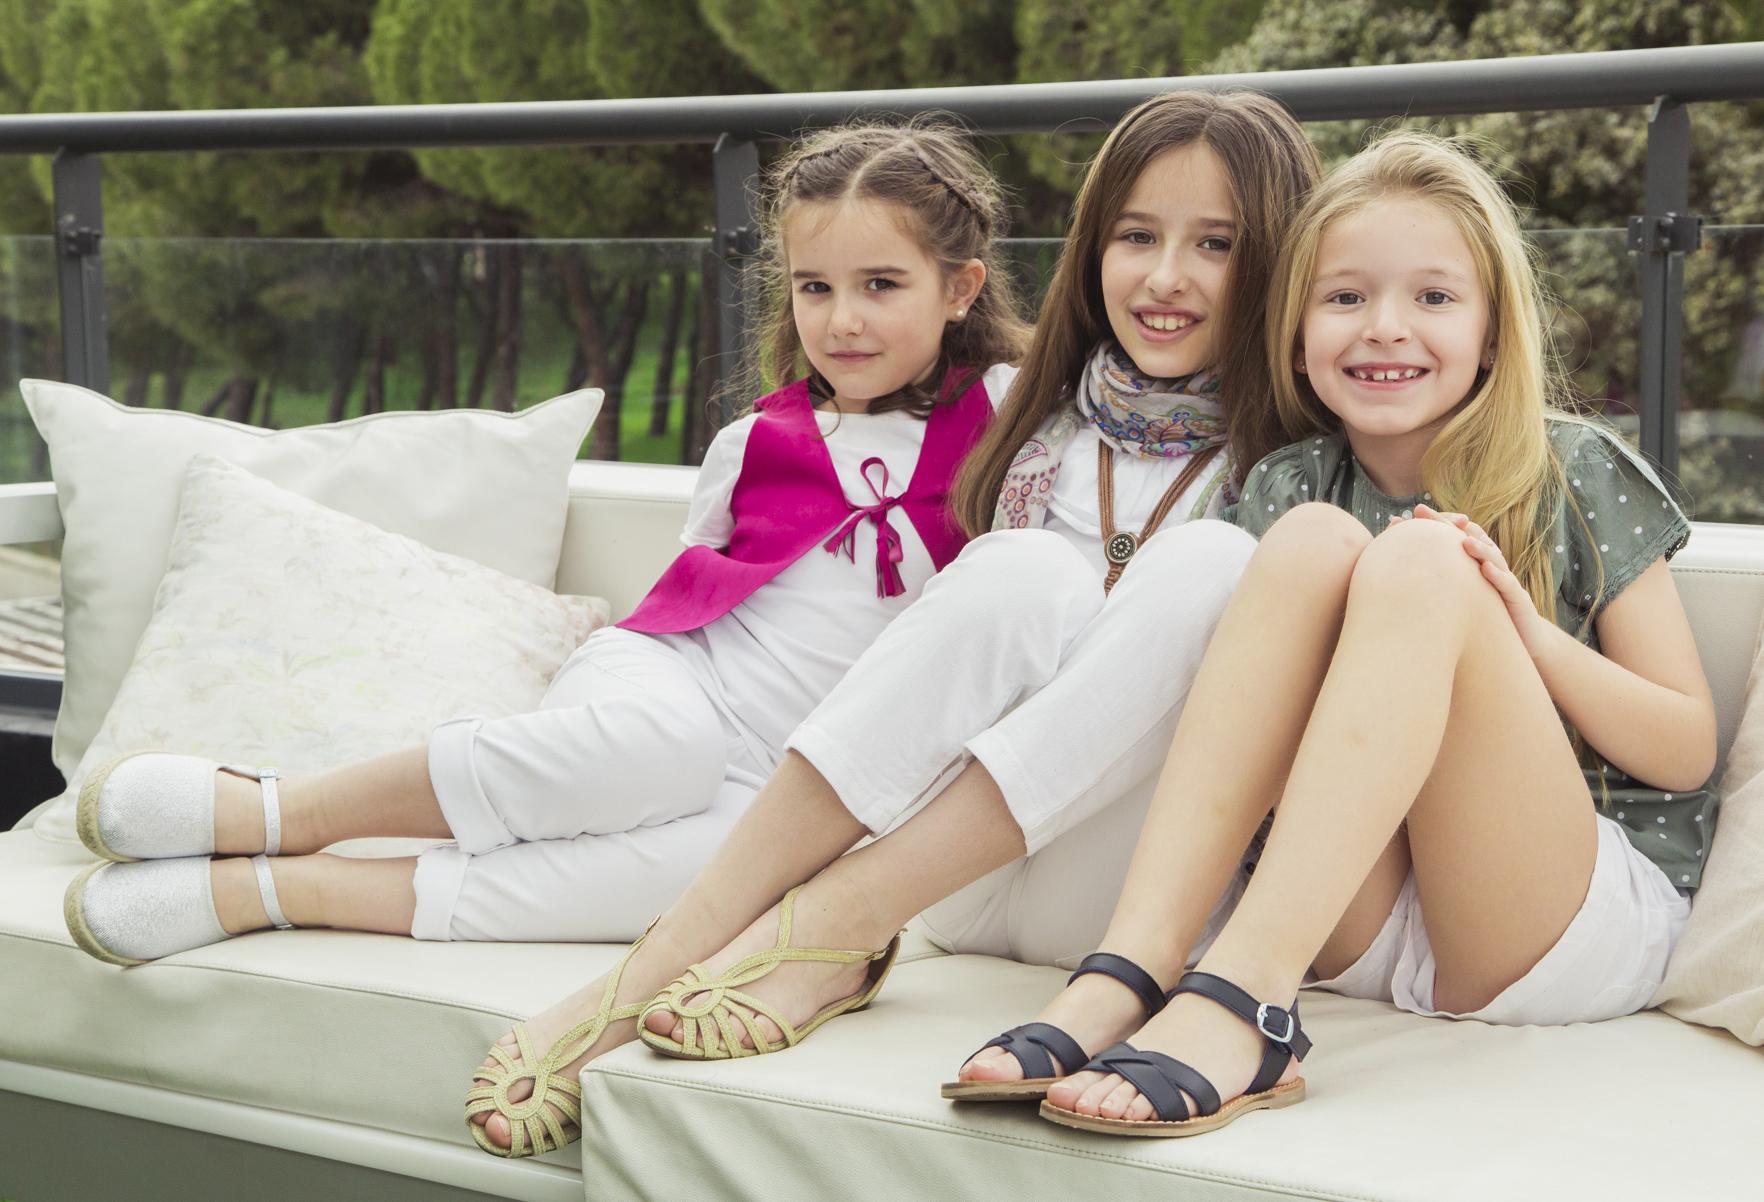 Sandálias Verão Meninas Pisamonas